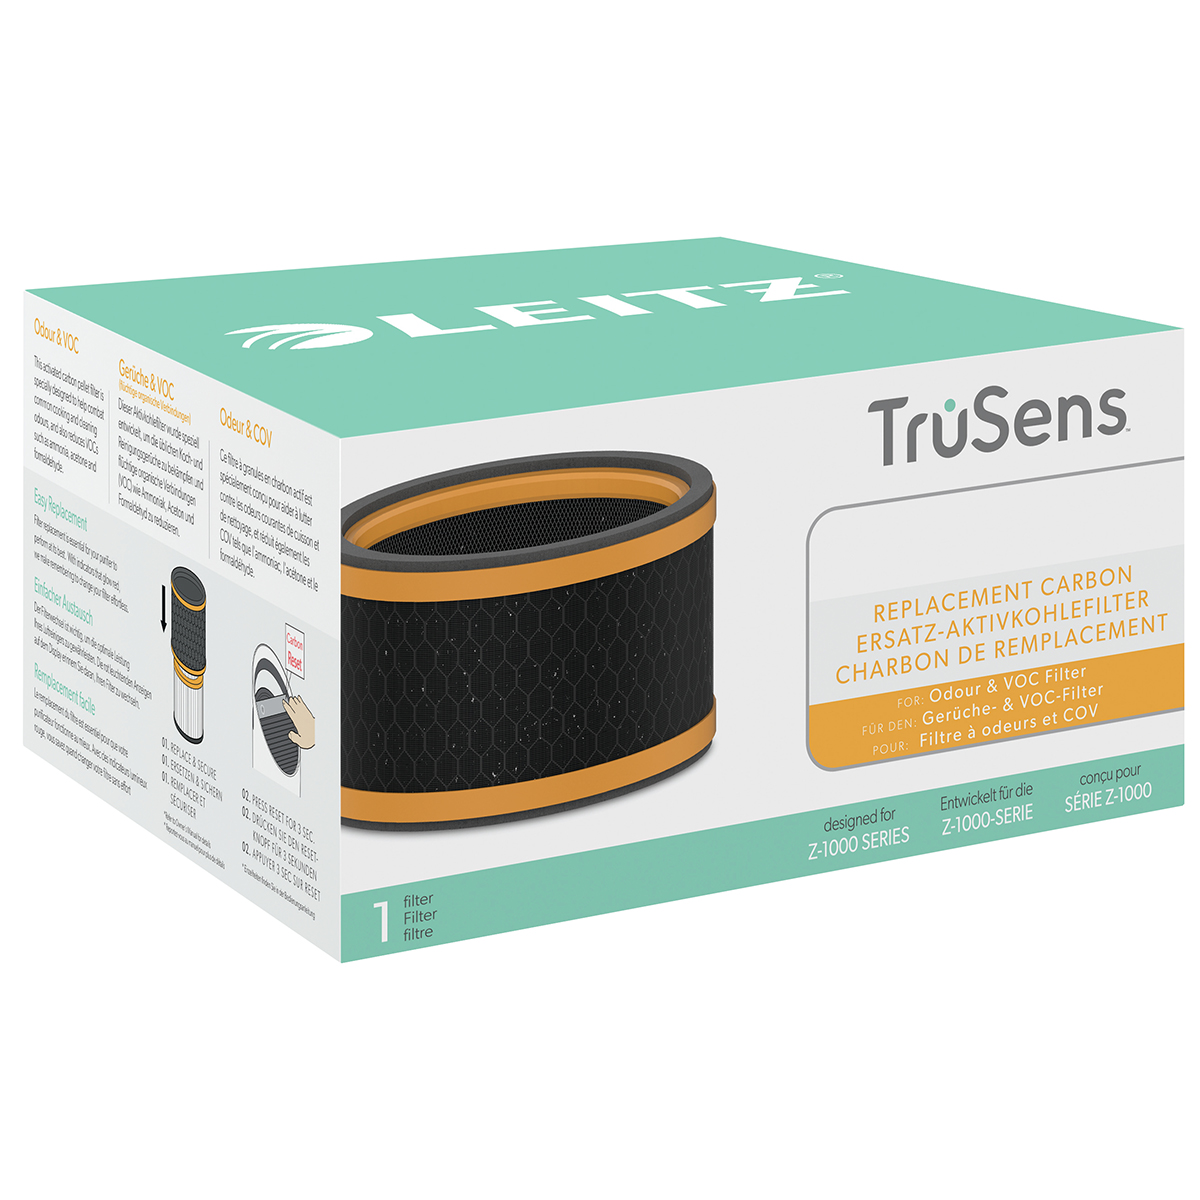 Leitz TruSens Z-1000 Odour and VOC 3-in-1 Carbon Filter